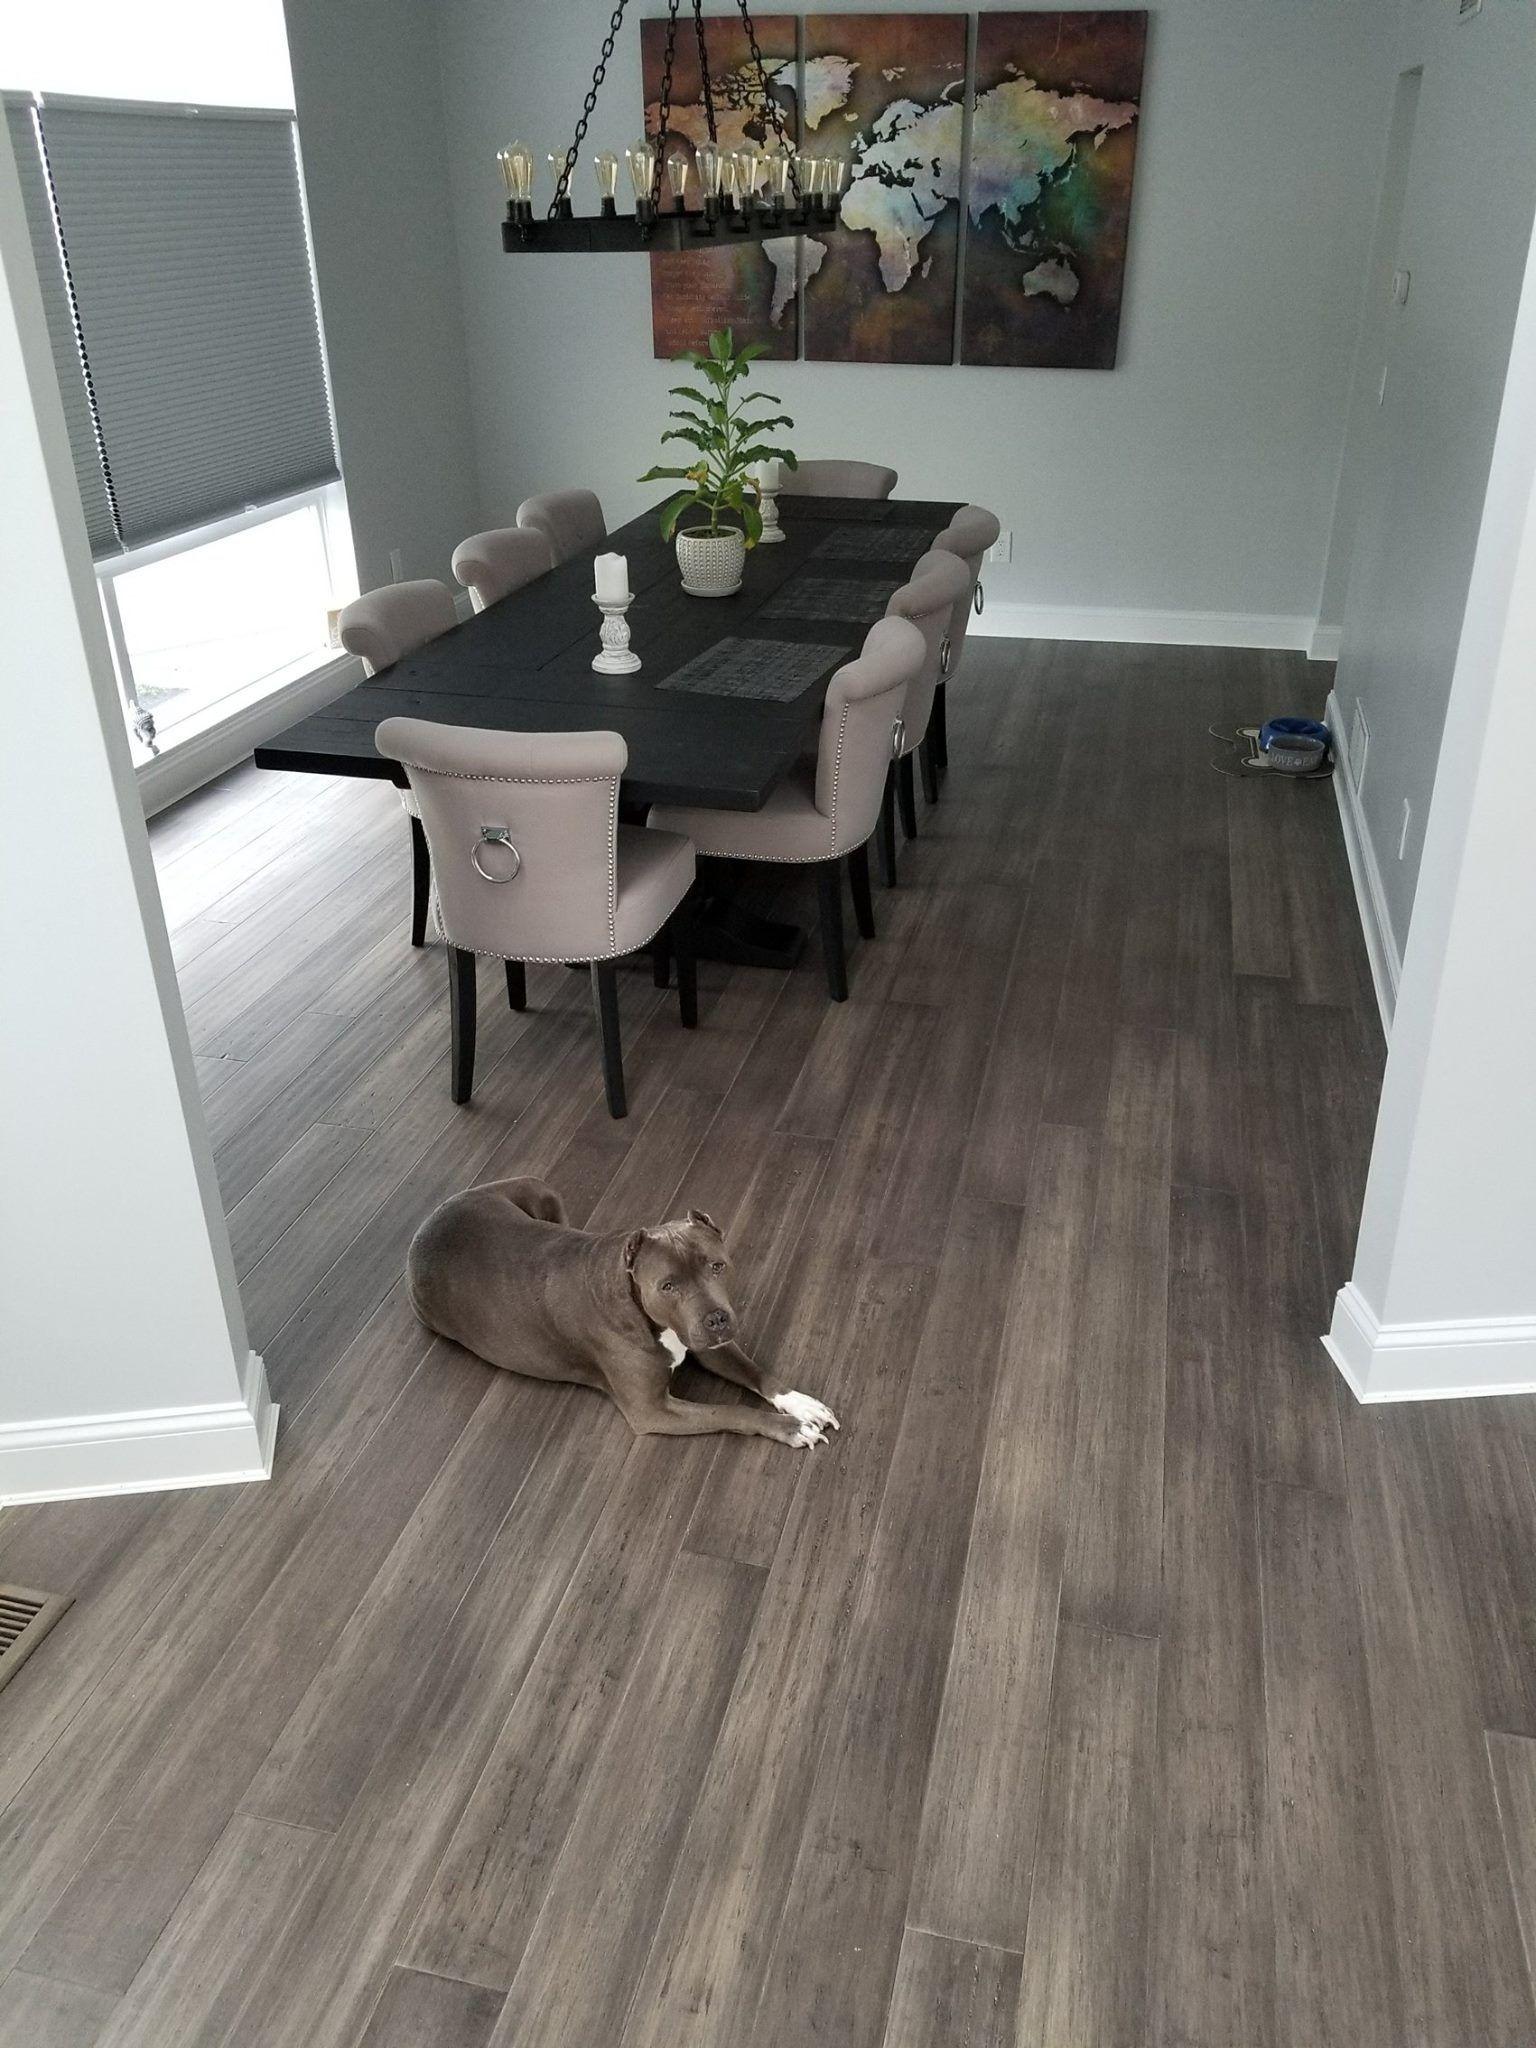 Boardwalk hardwood narrow plank bamboo flooring sample in